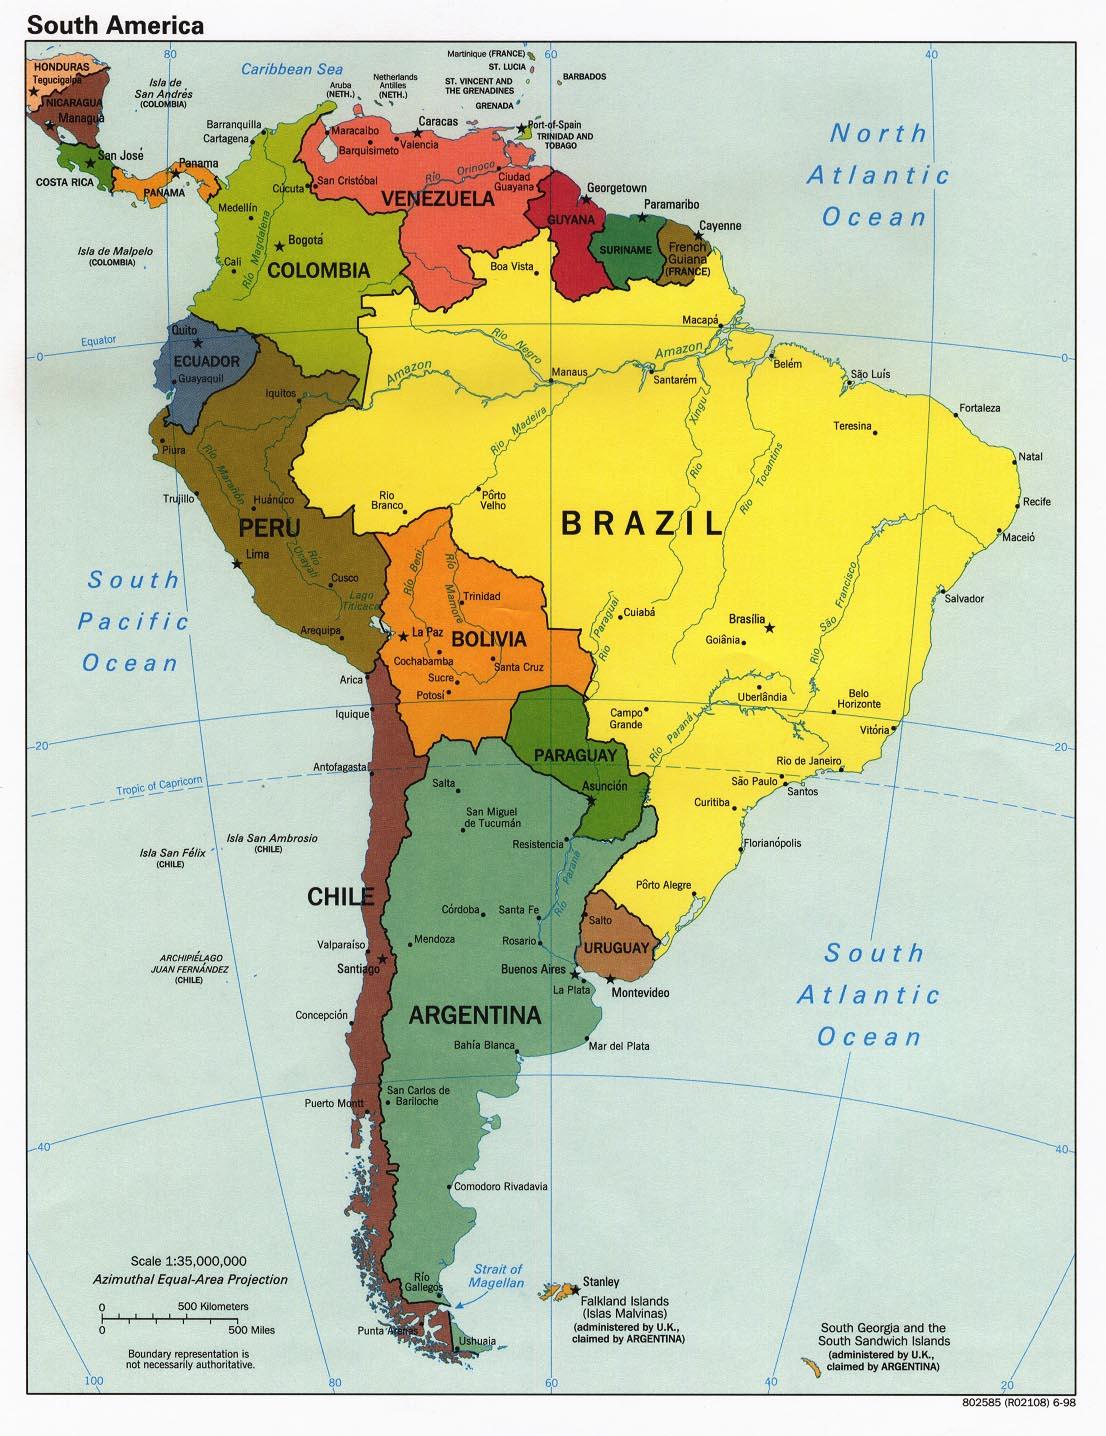 mapa da america do sul Image   Mapa da america do sul politico. | R2D Wiki | FANDOM  mapa da america do sul